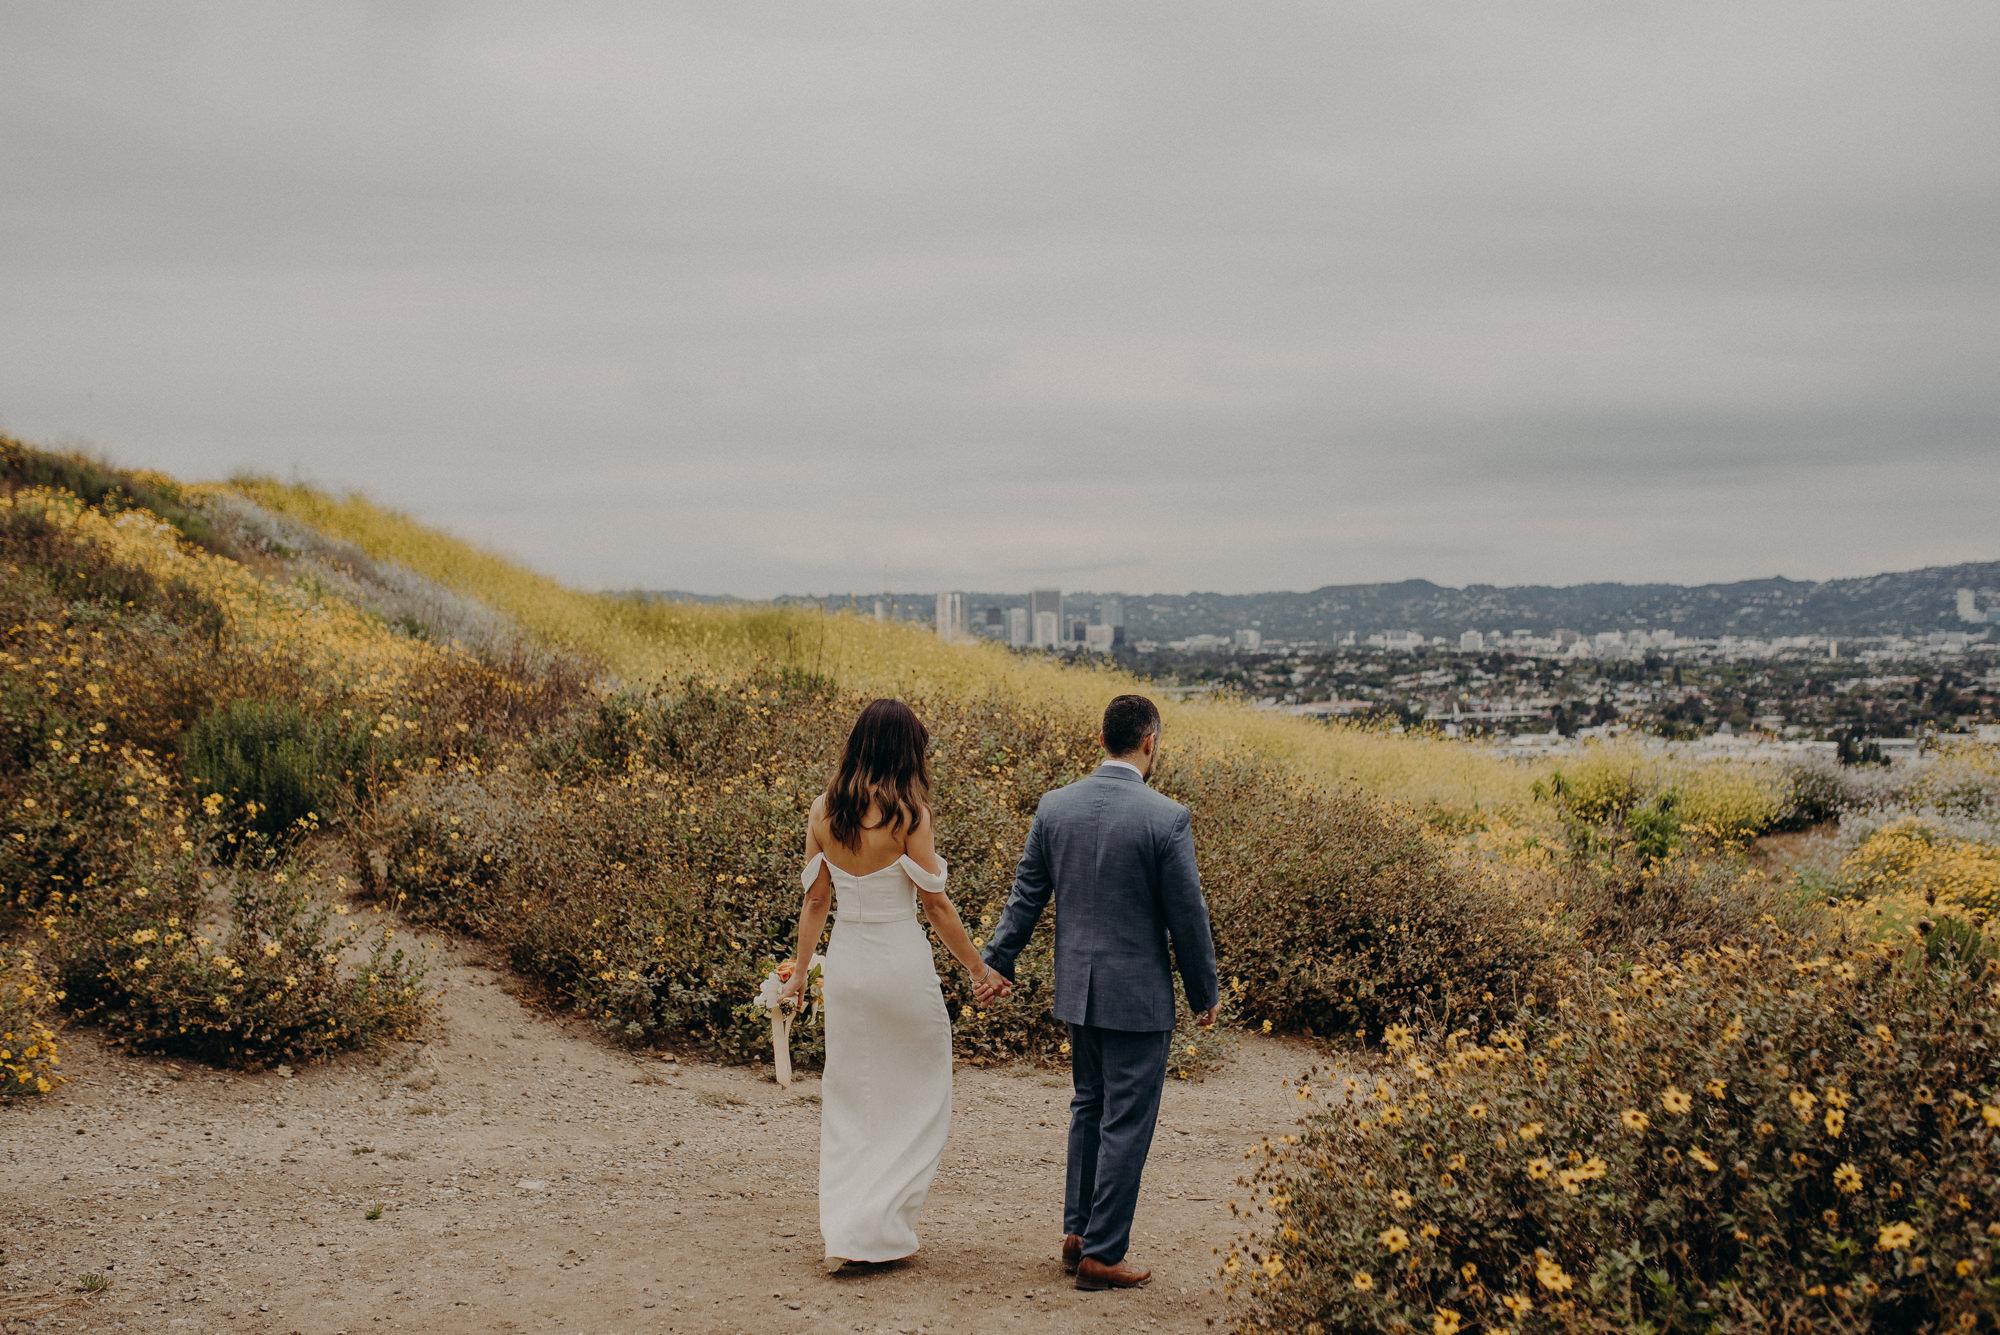 elopement photographer in los angeles - la wedding photographer - isaiahandtaylor.com-036.jpg